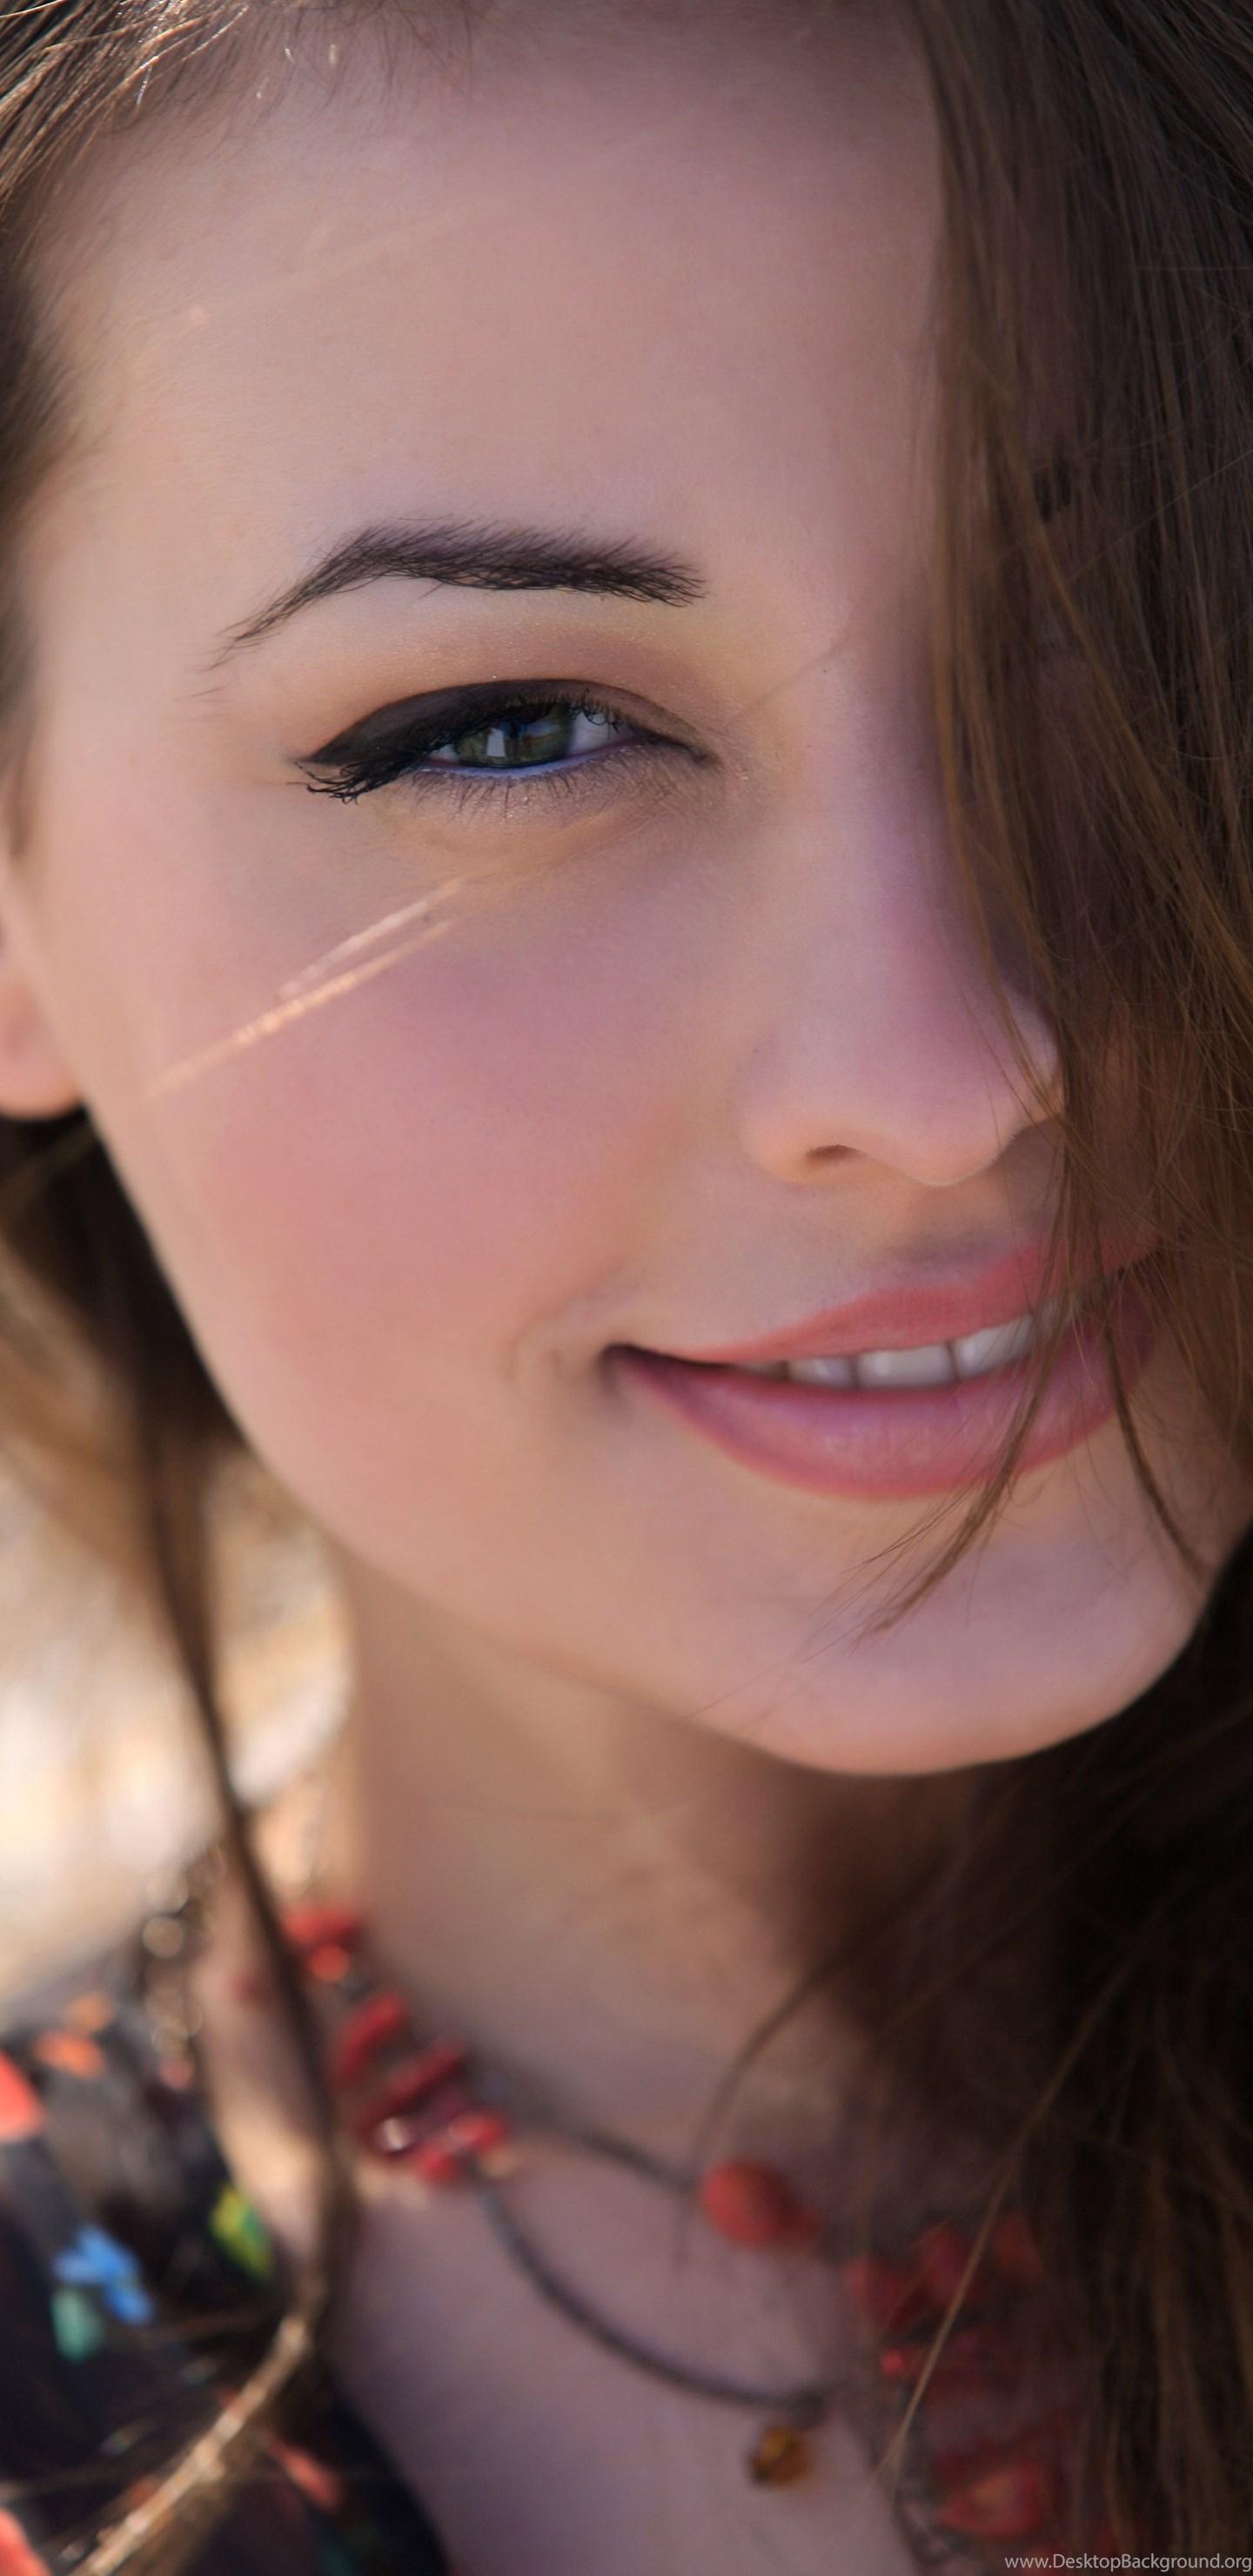 Cute Girl Image Hd Wallpapers Desktop Background